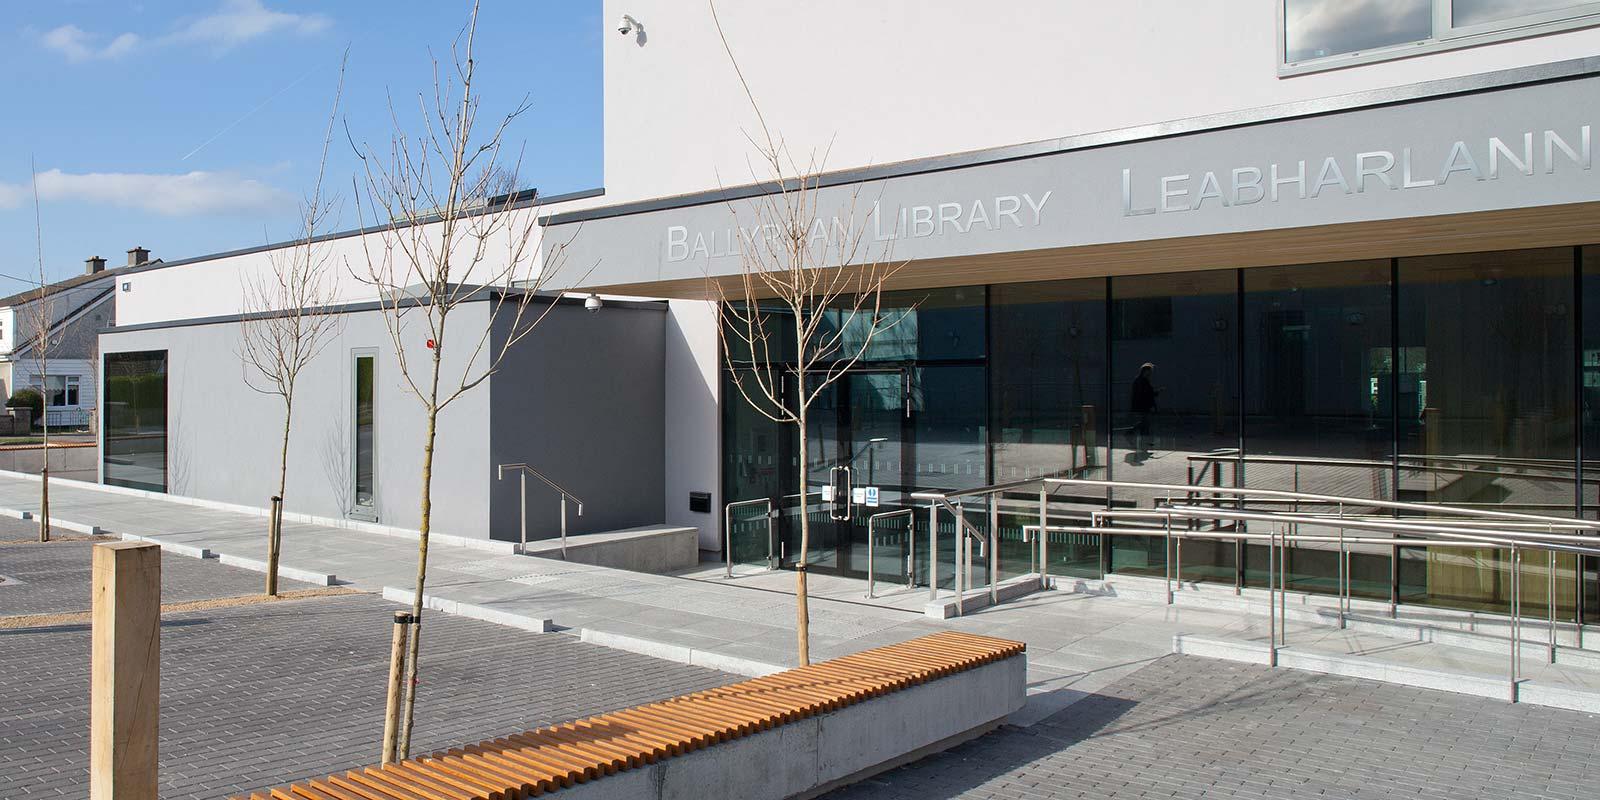 Ballyroan Library 5